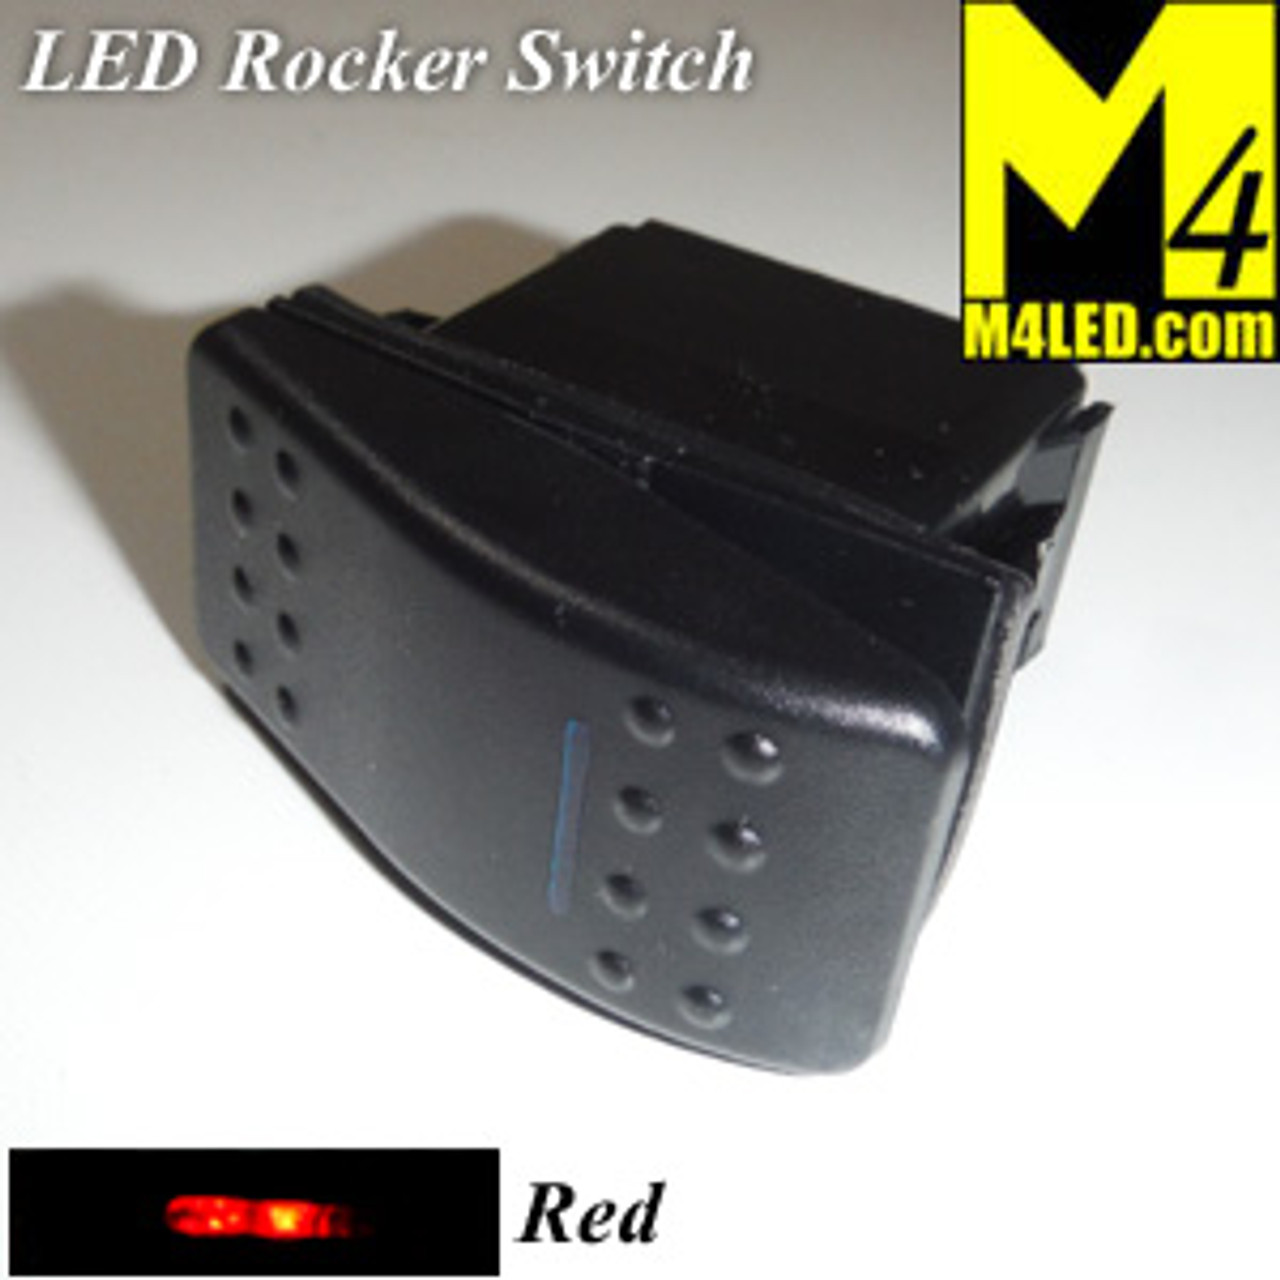 SWITCH-ROCKER-RED 20 Amp Red Rocker Switch